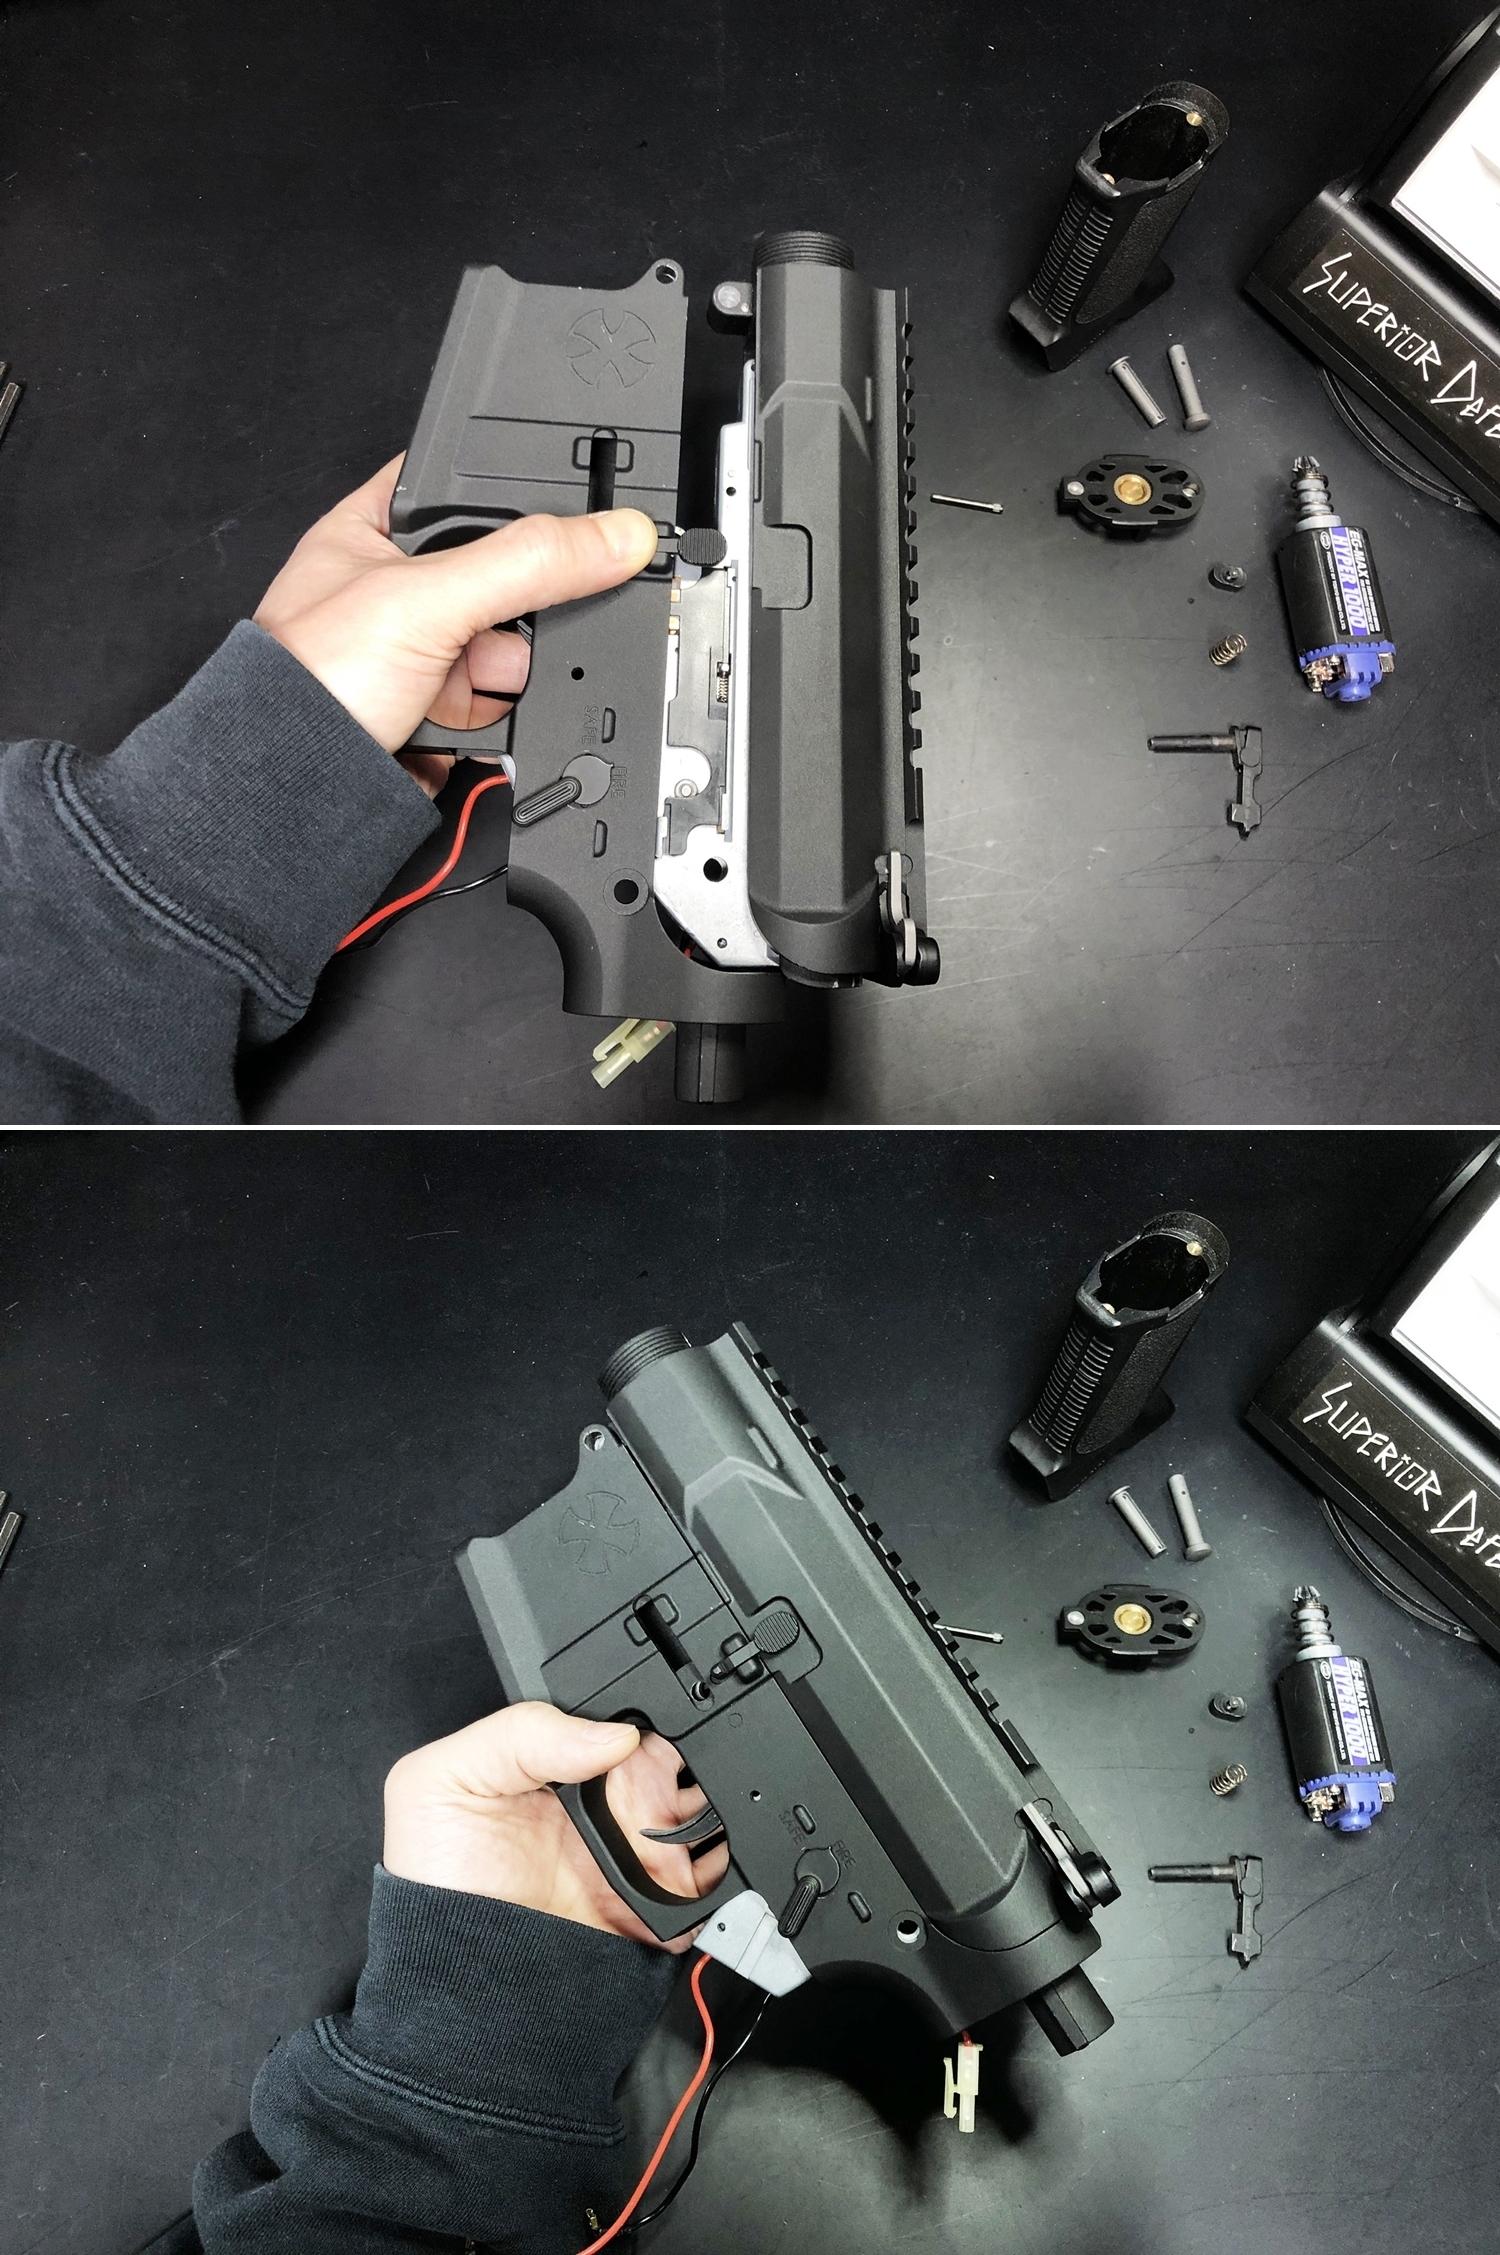 22 NOVESKE GEN3 N4 BY MADBULL!! 『第一弾』 新たにSTD民間系ARを作り始めたいと思います!! STD AR-15 M4 スタンダード 電動ガン マルイ ノベスケ ノベスキー マットブル メタルフレーム 動作テスト 組込 取付 カス